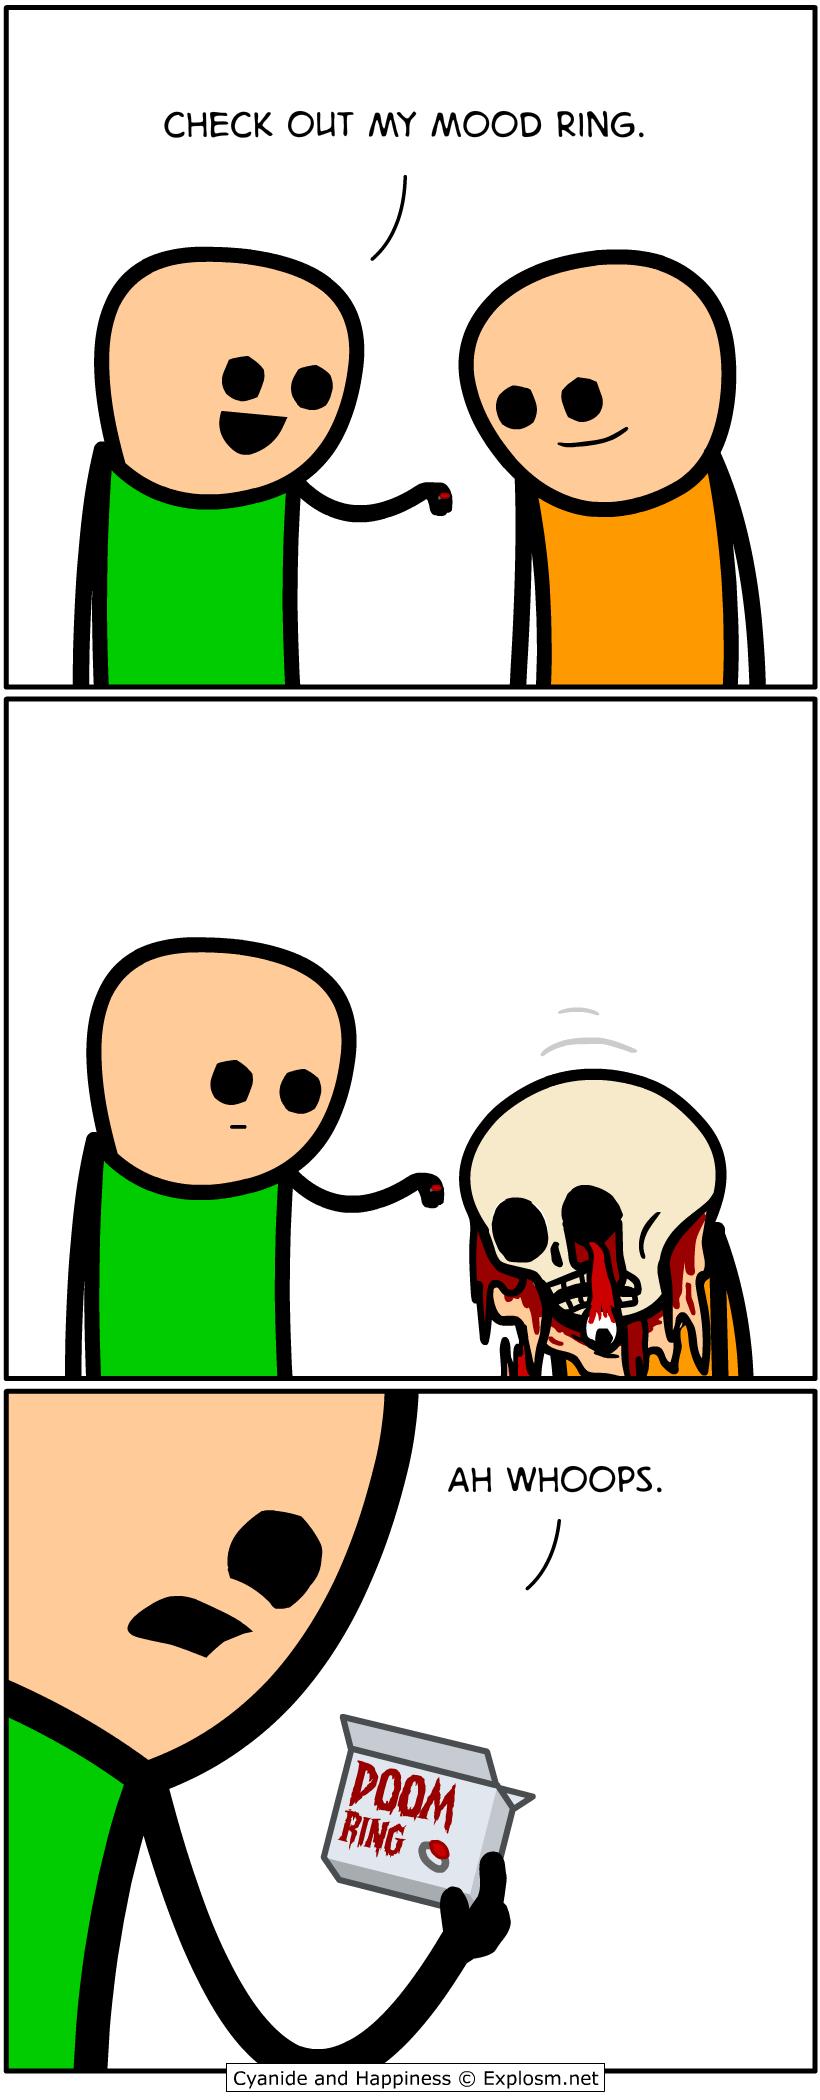 http://files.explosm.net/comics/Rob/mood-ring.png